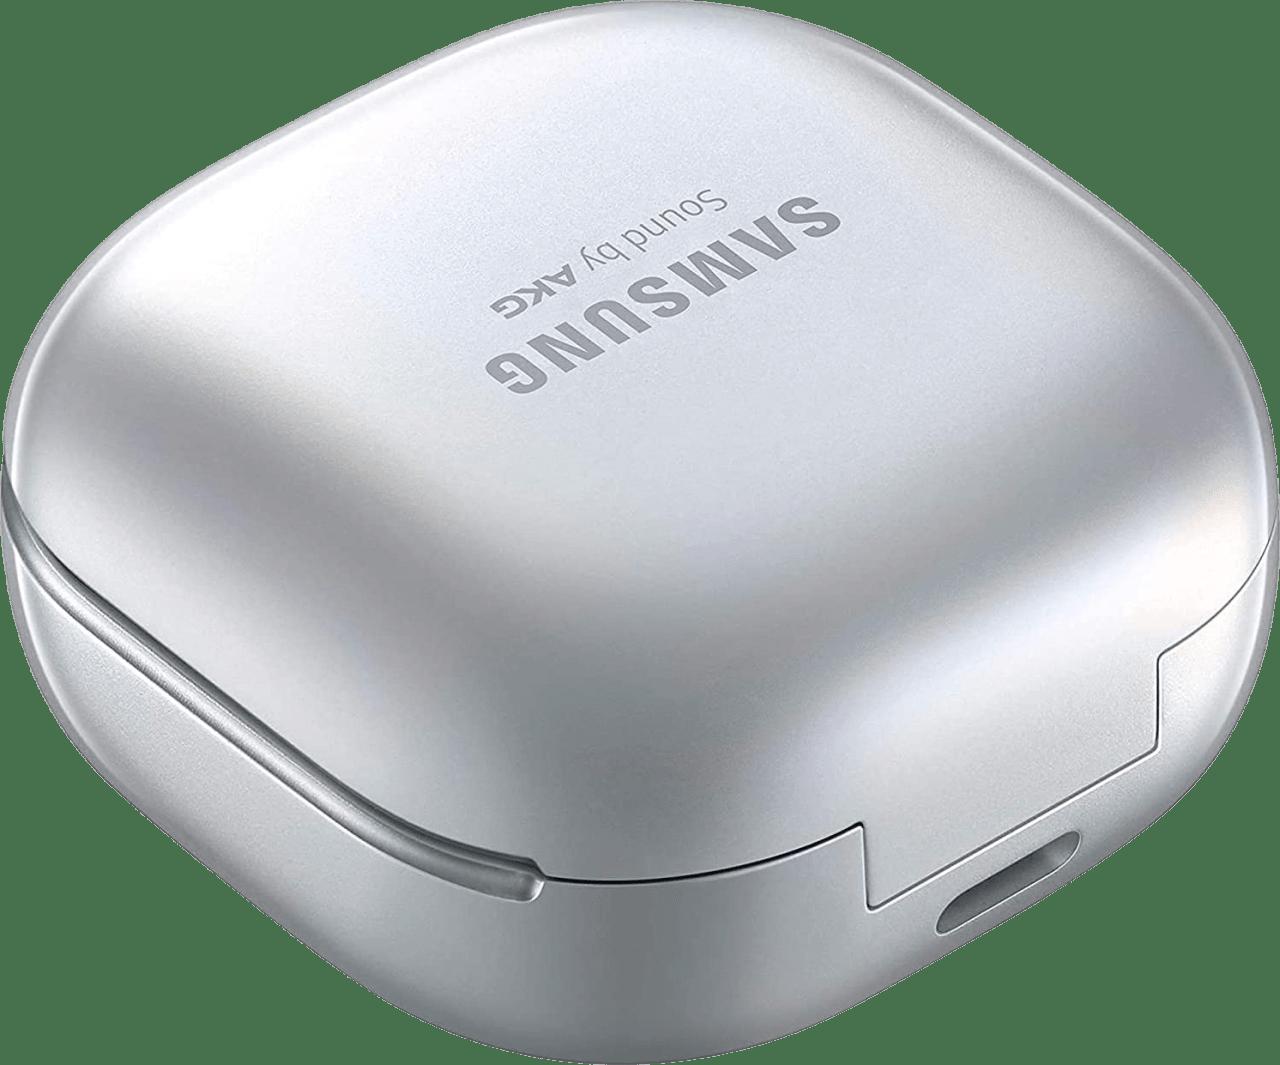 Phantom Silber Samsung Galaxy Buds Pro In-ear headphones.5